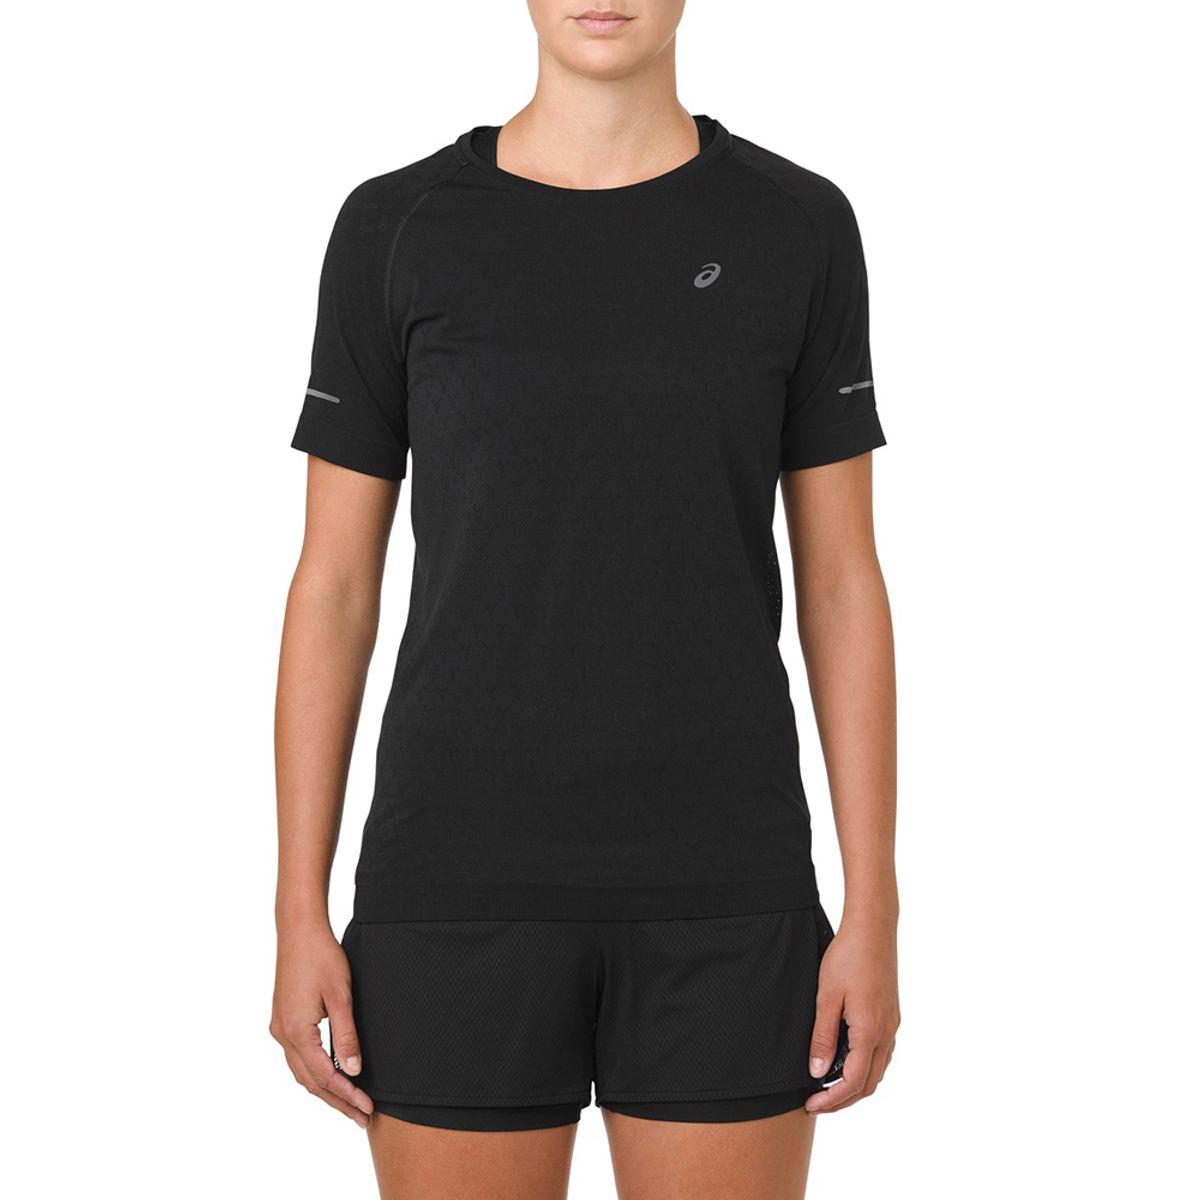 Camiseta-Asics-Sleeve-GEL-Cool---Feminino---Preta